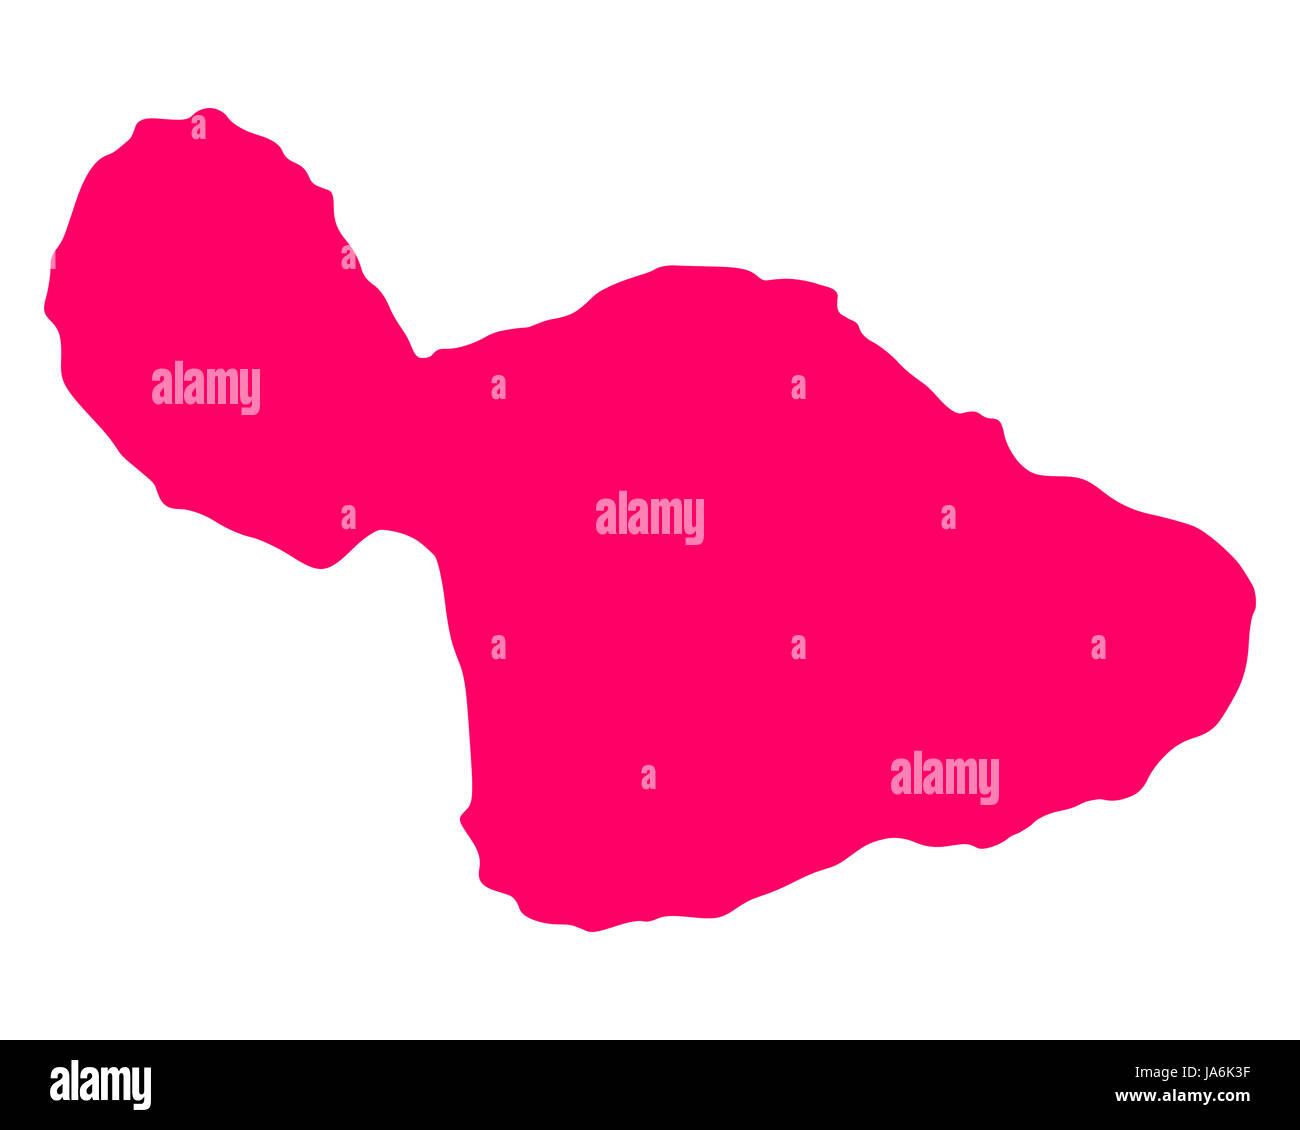 Karte von Maui - Stock Image